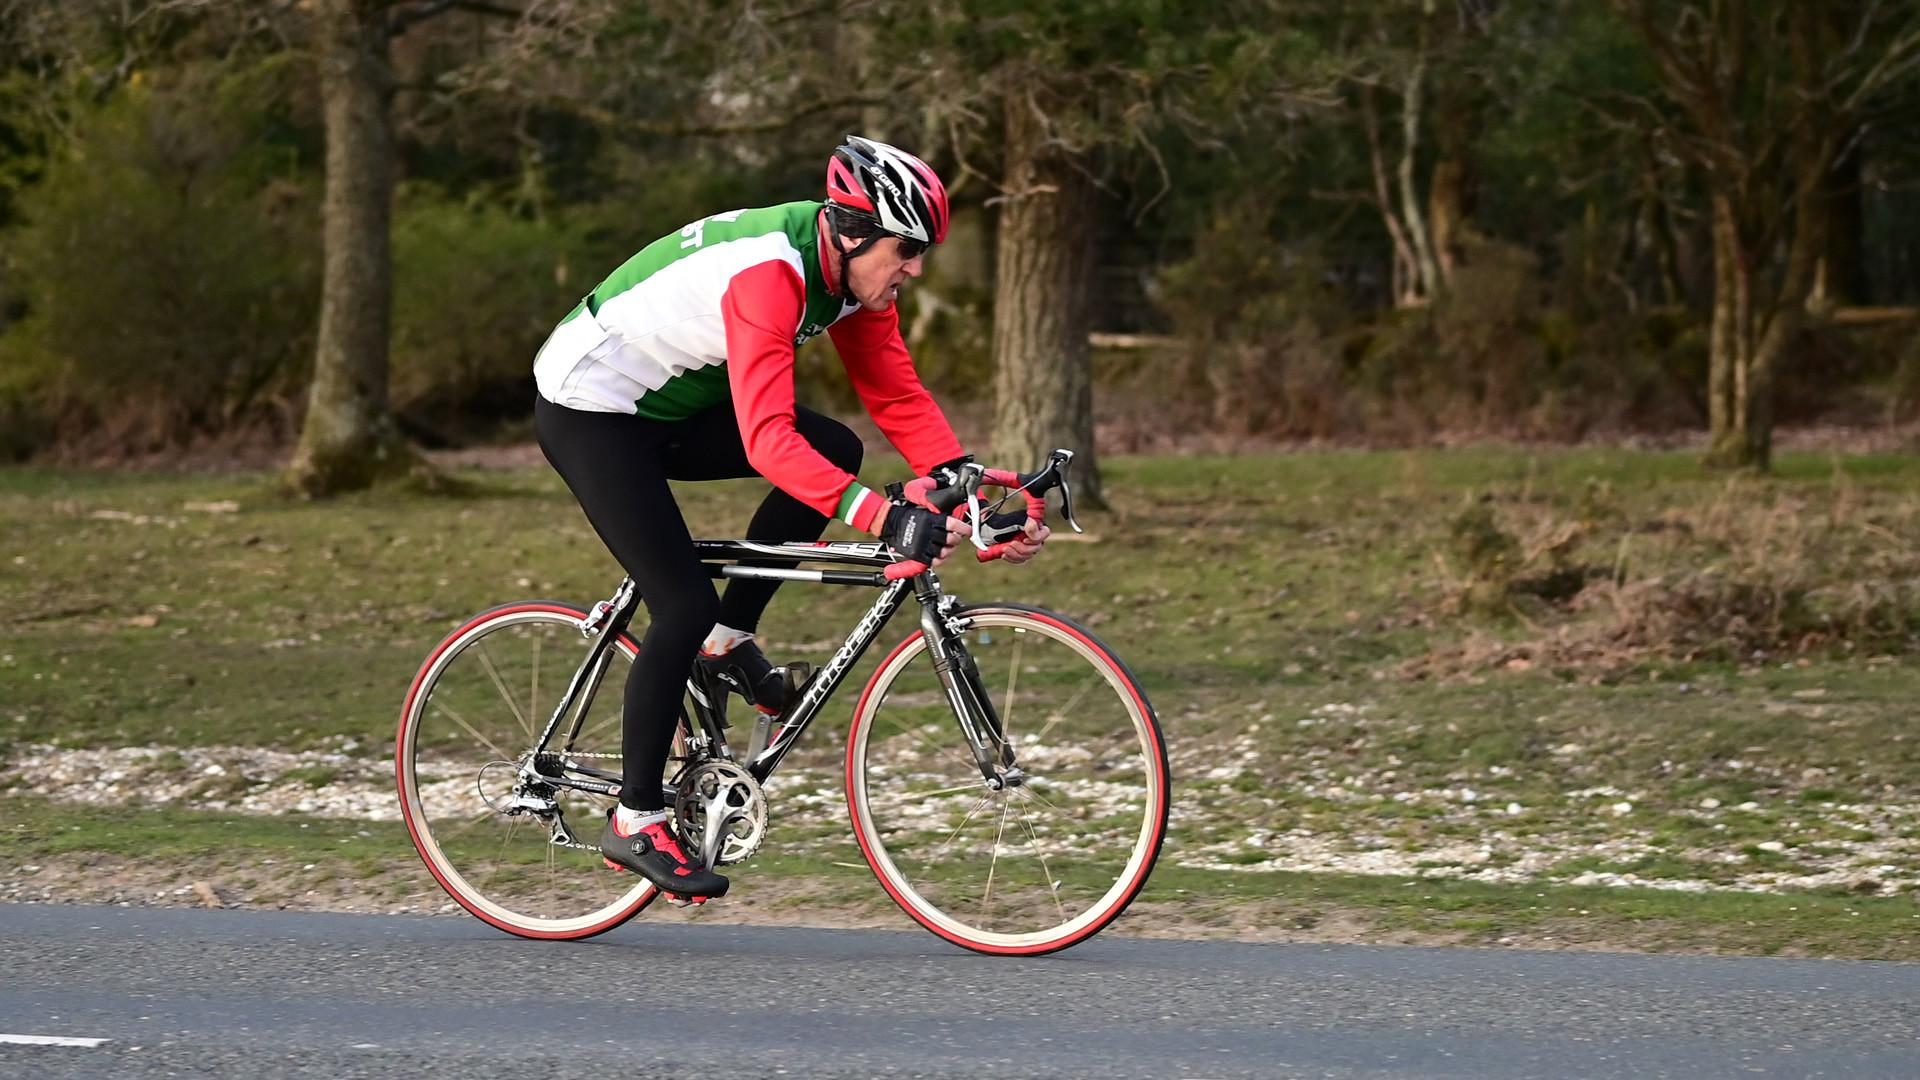 P182_roadbike_Interclub_TT_15.4.21_09